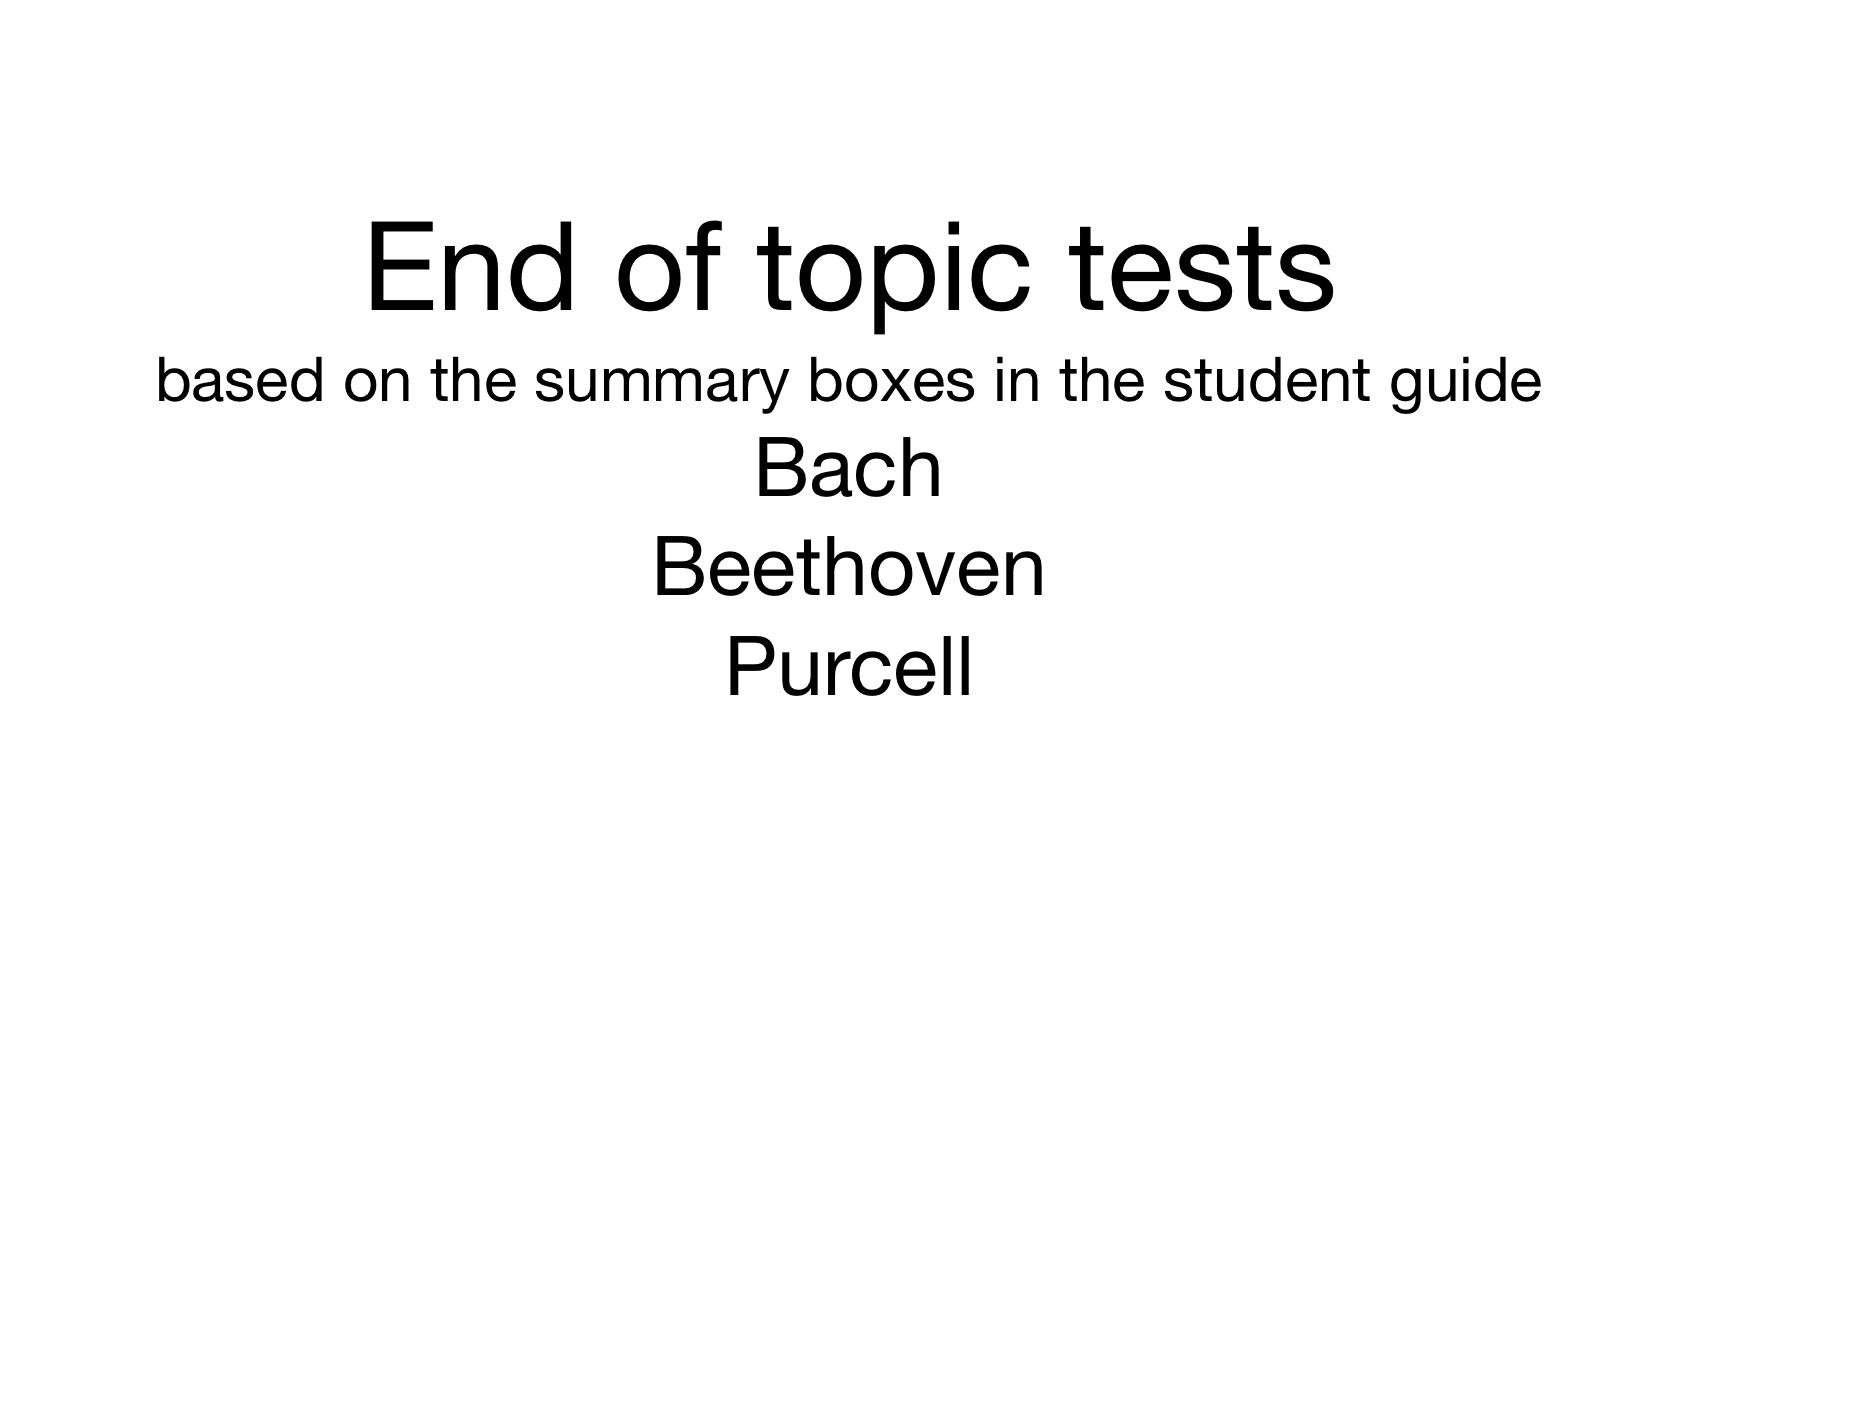 MUSIC EDEXCEL GCSE (9-1) BUNDLE OF TESTS